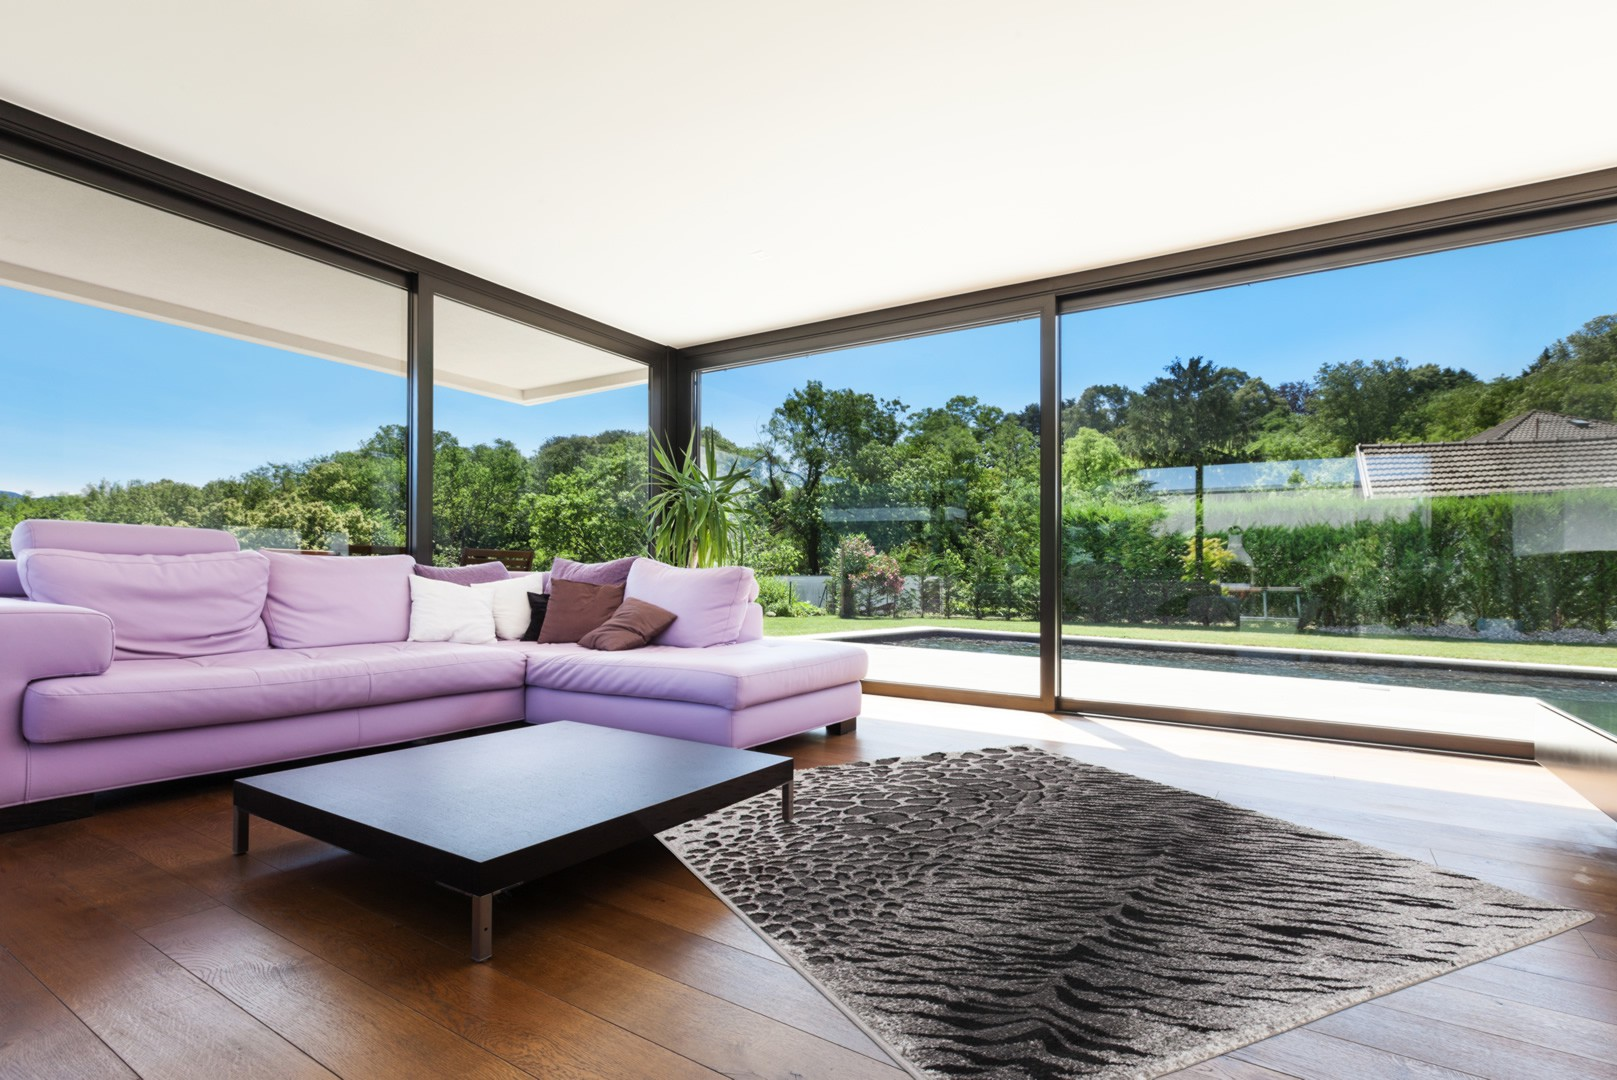 tapis imitation peau de b te argent en polypropyl ne vulture. Black Bedroom Furniture Sets. Home Design Ideas